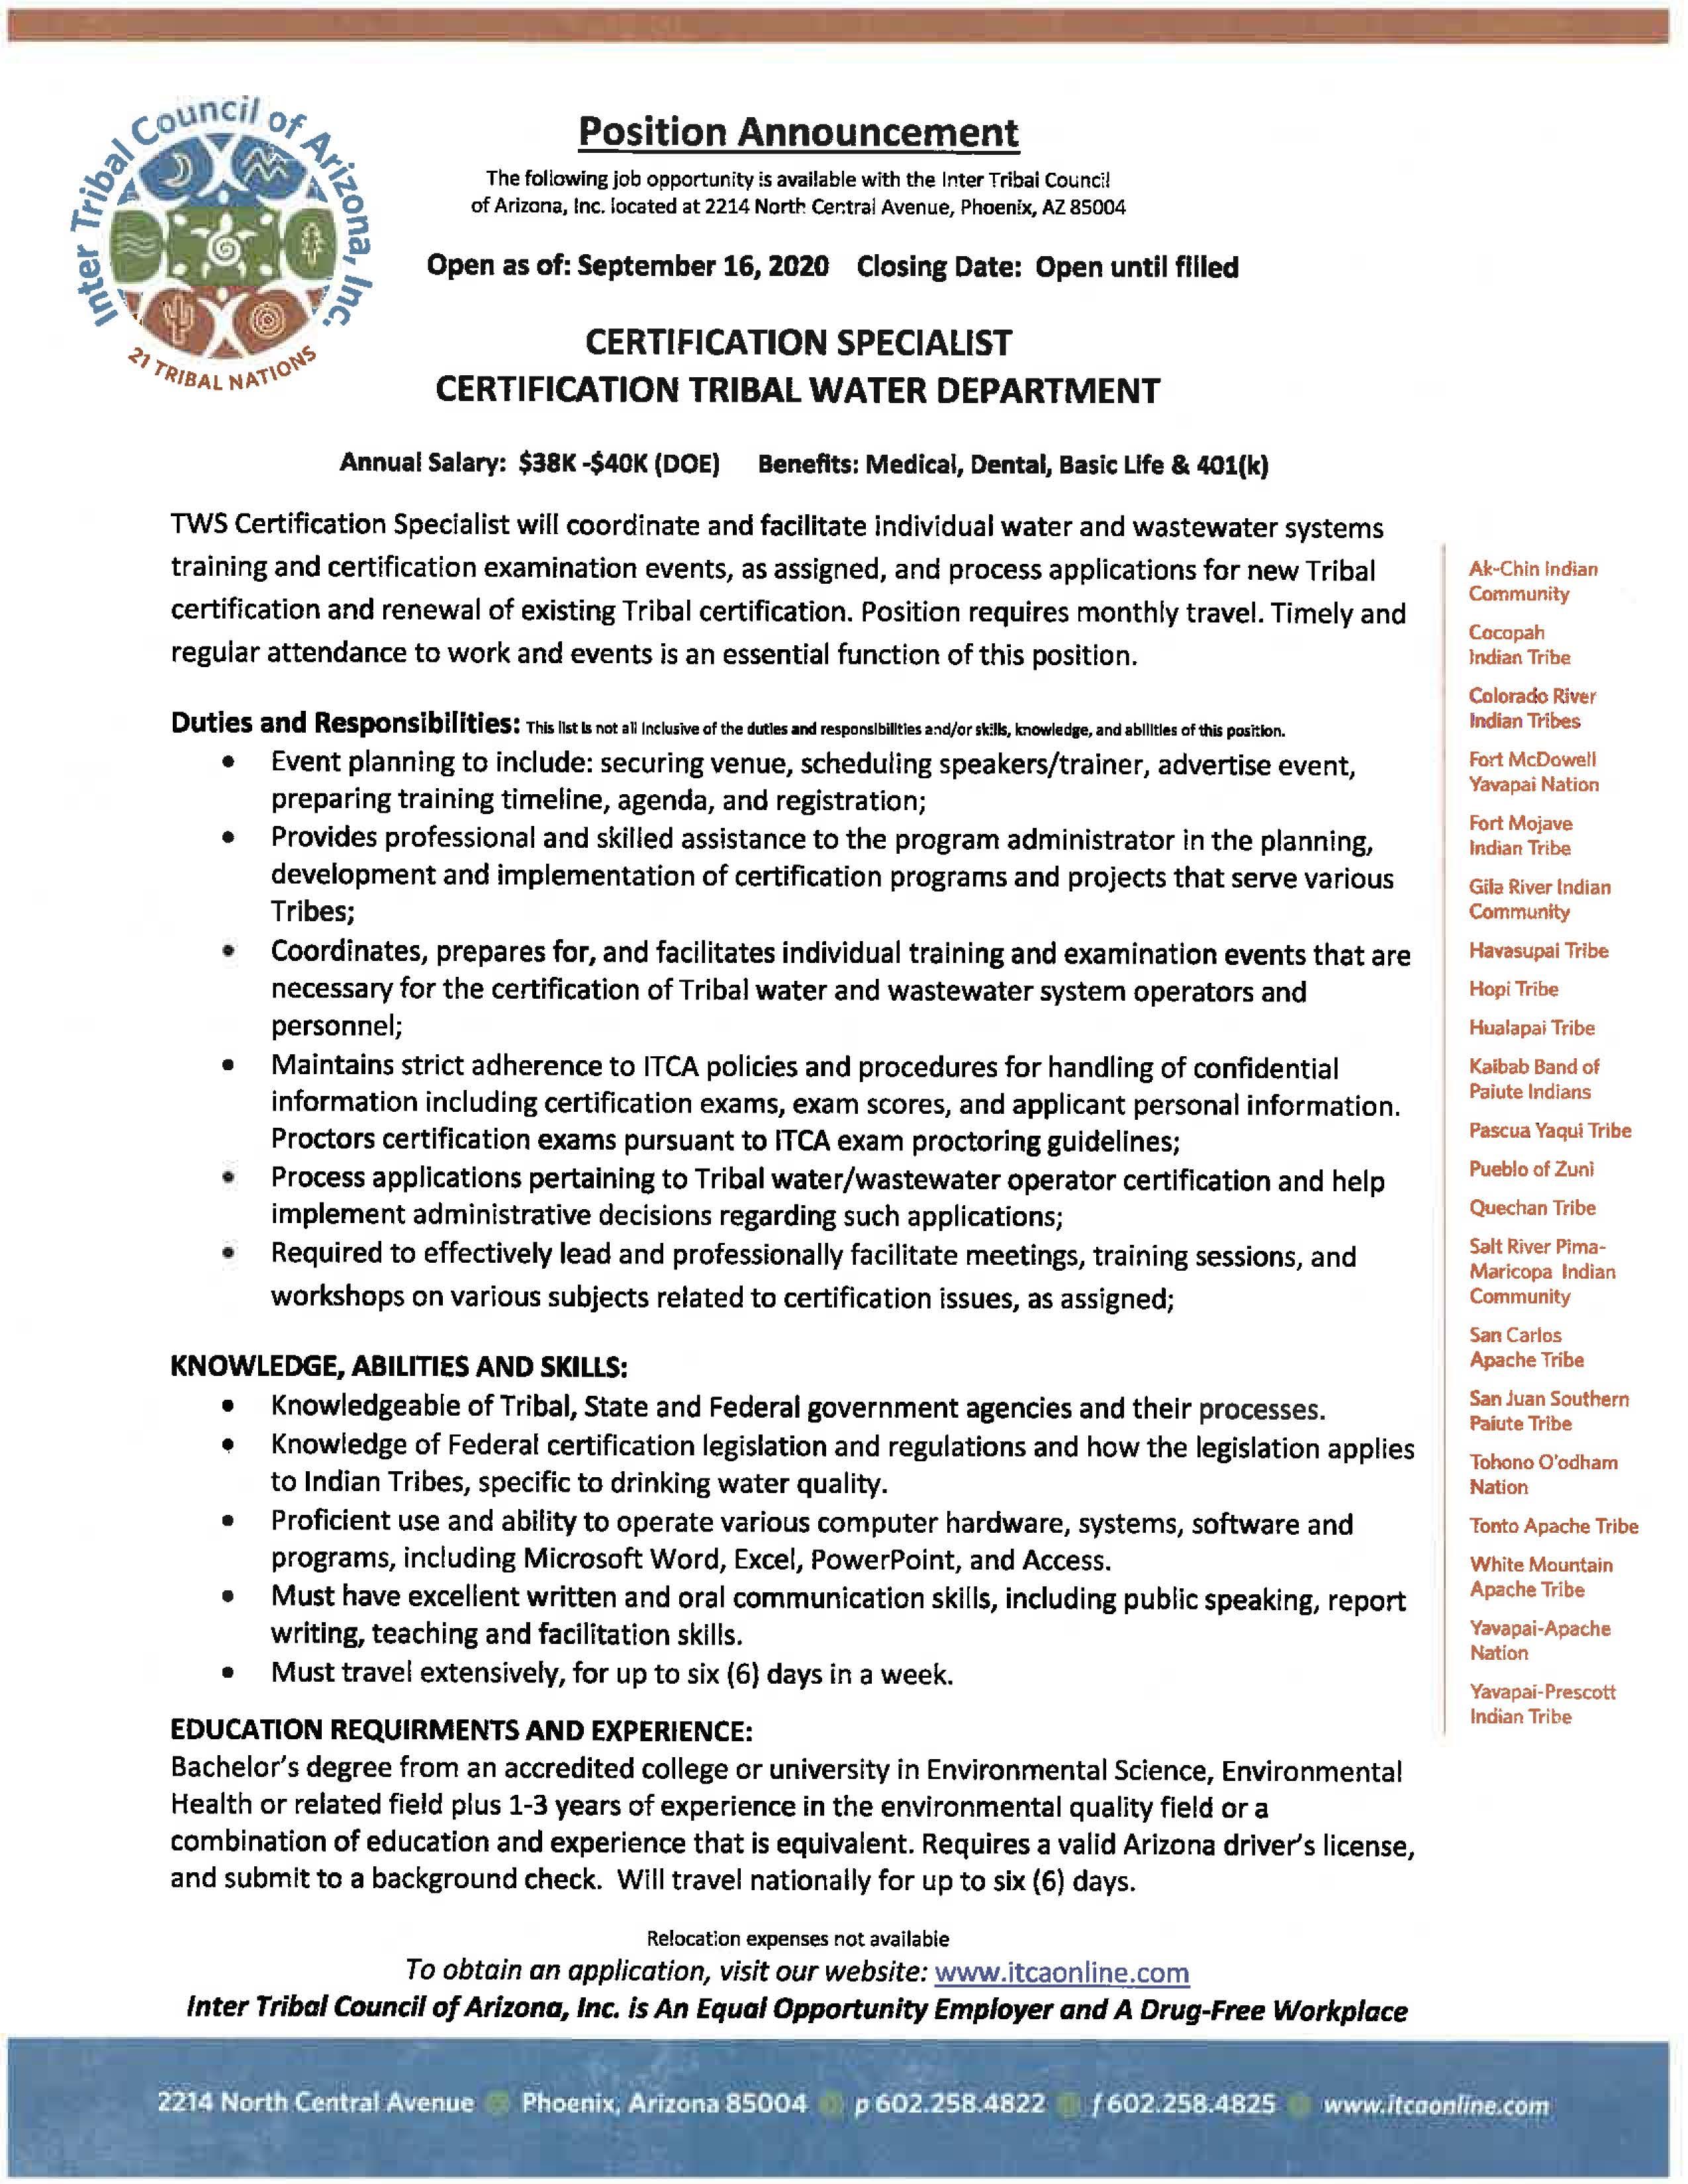 Certification Specialist - Tribal Water Department Job Posting